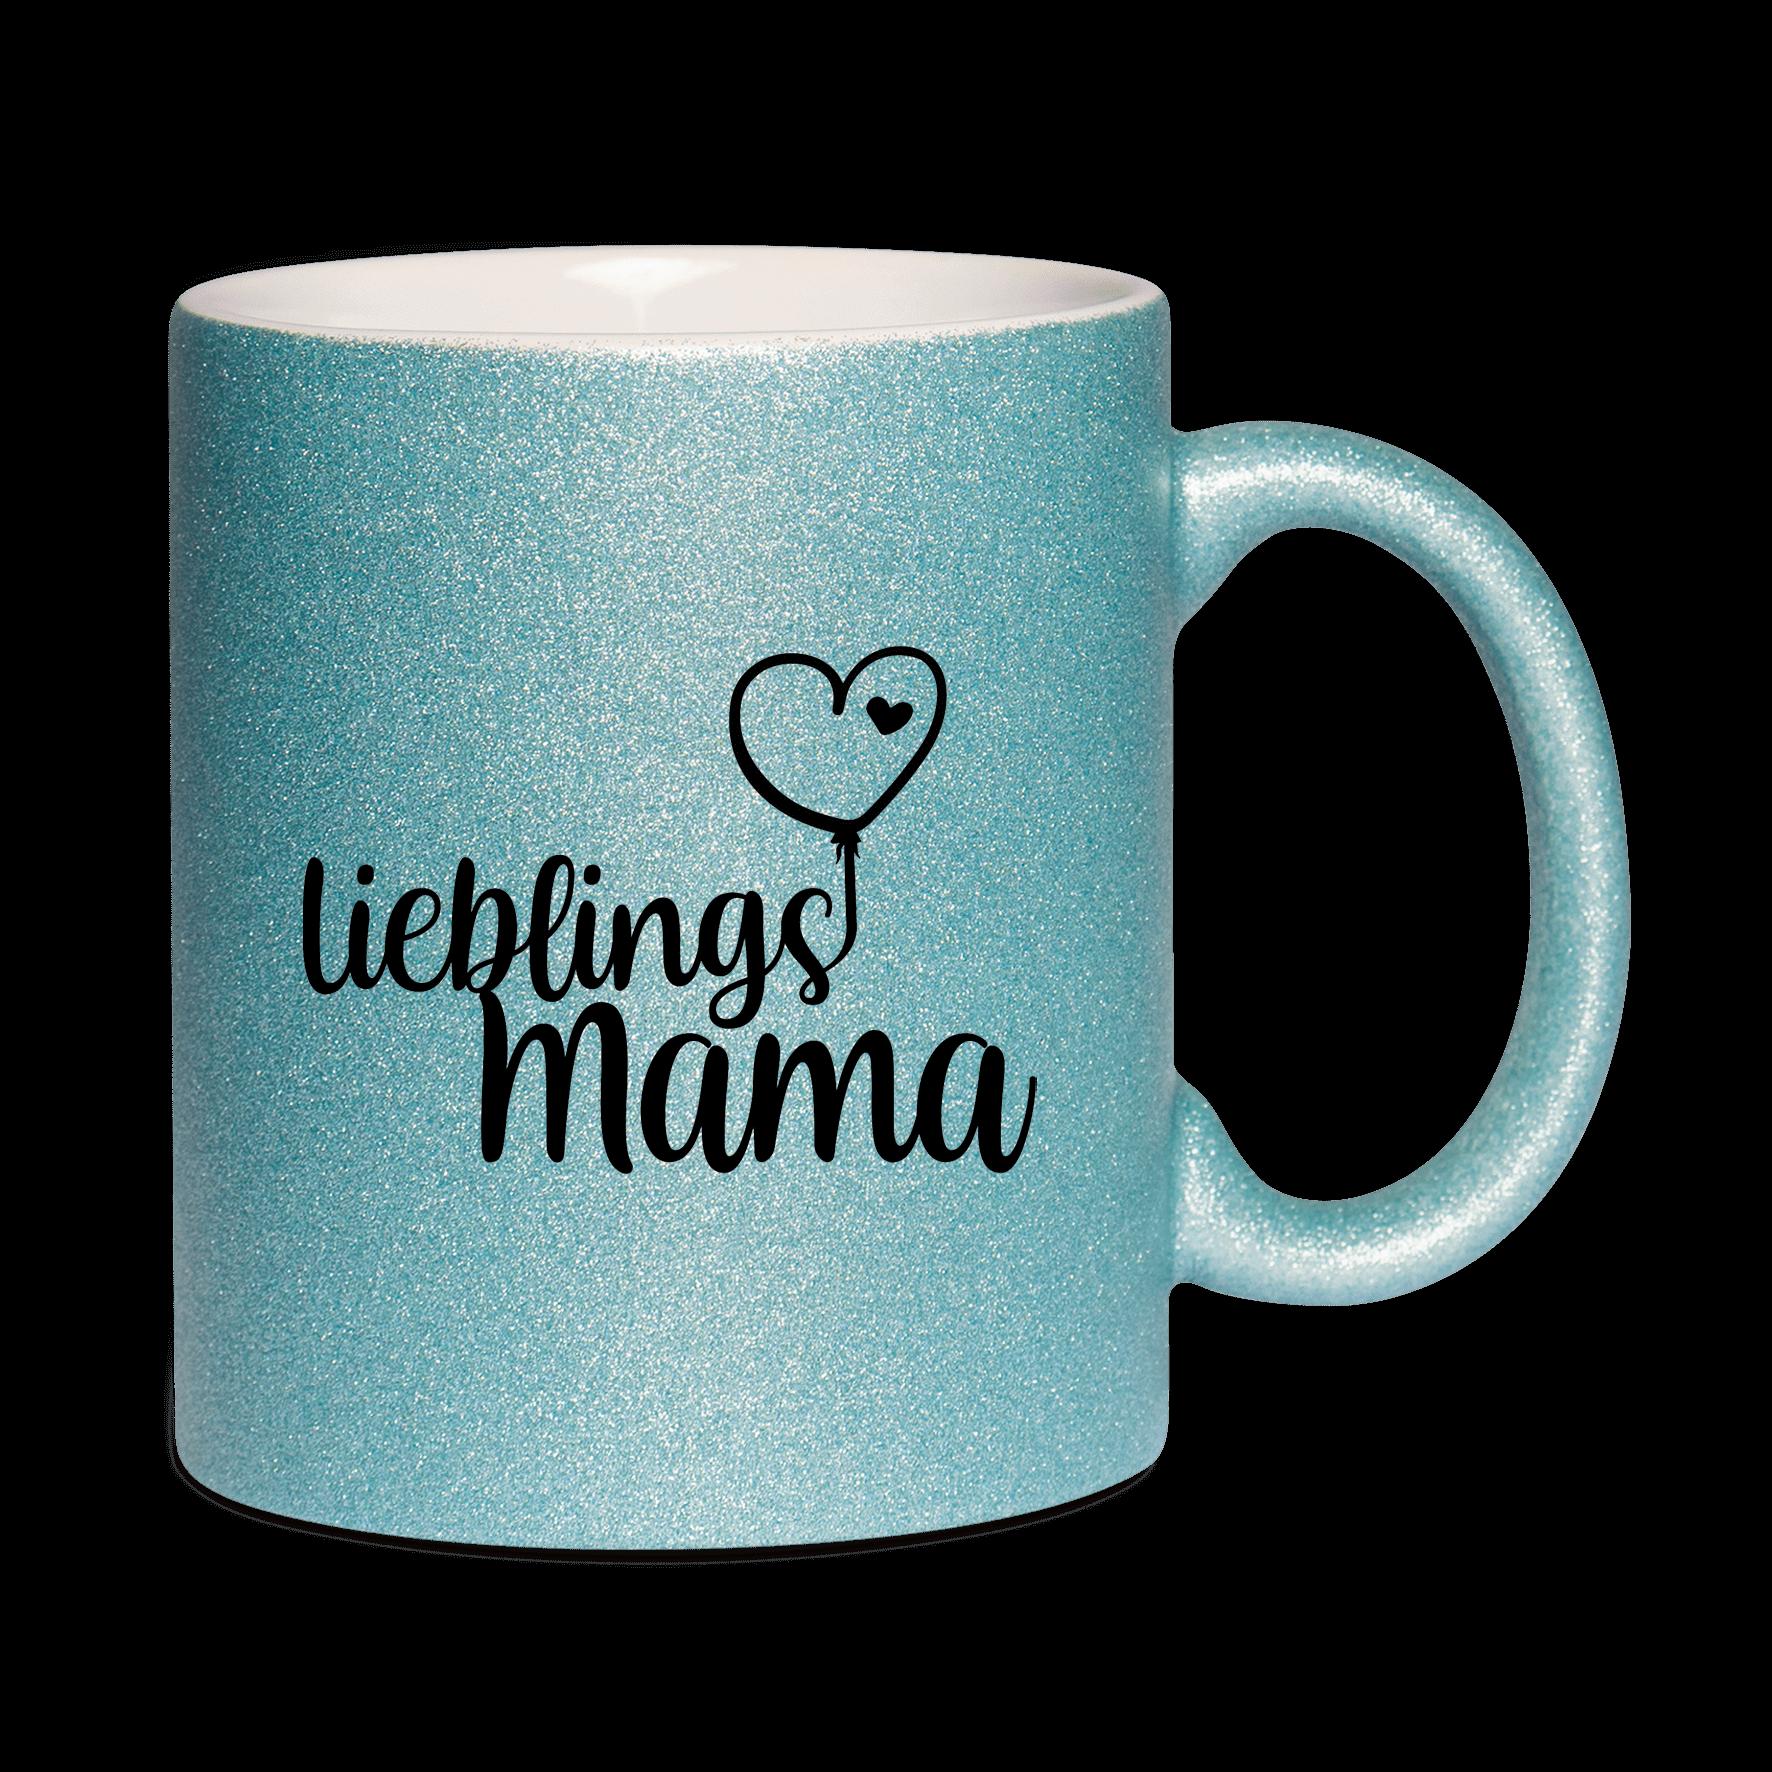 Lieblings Mama